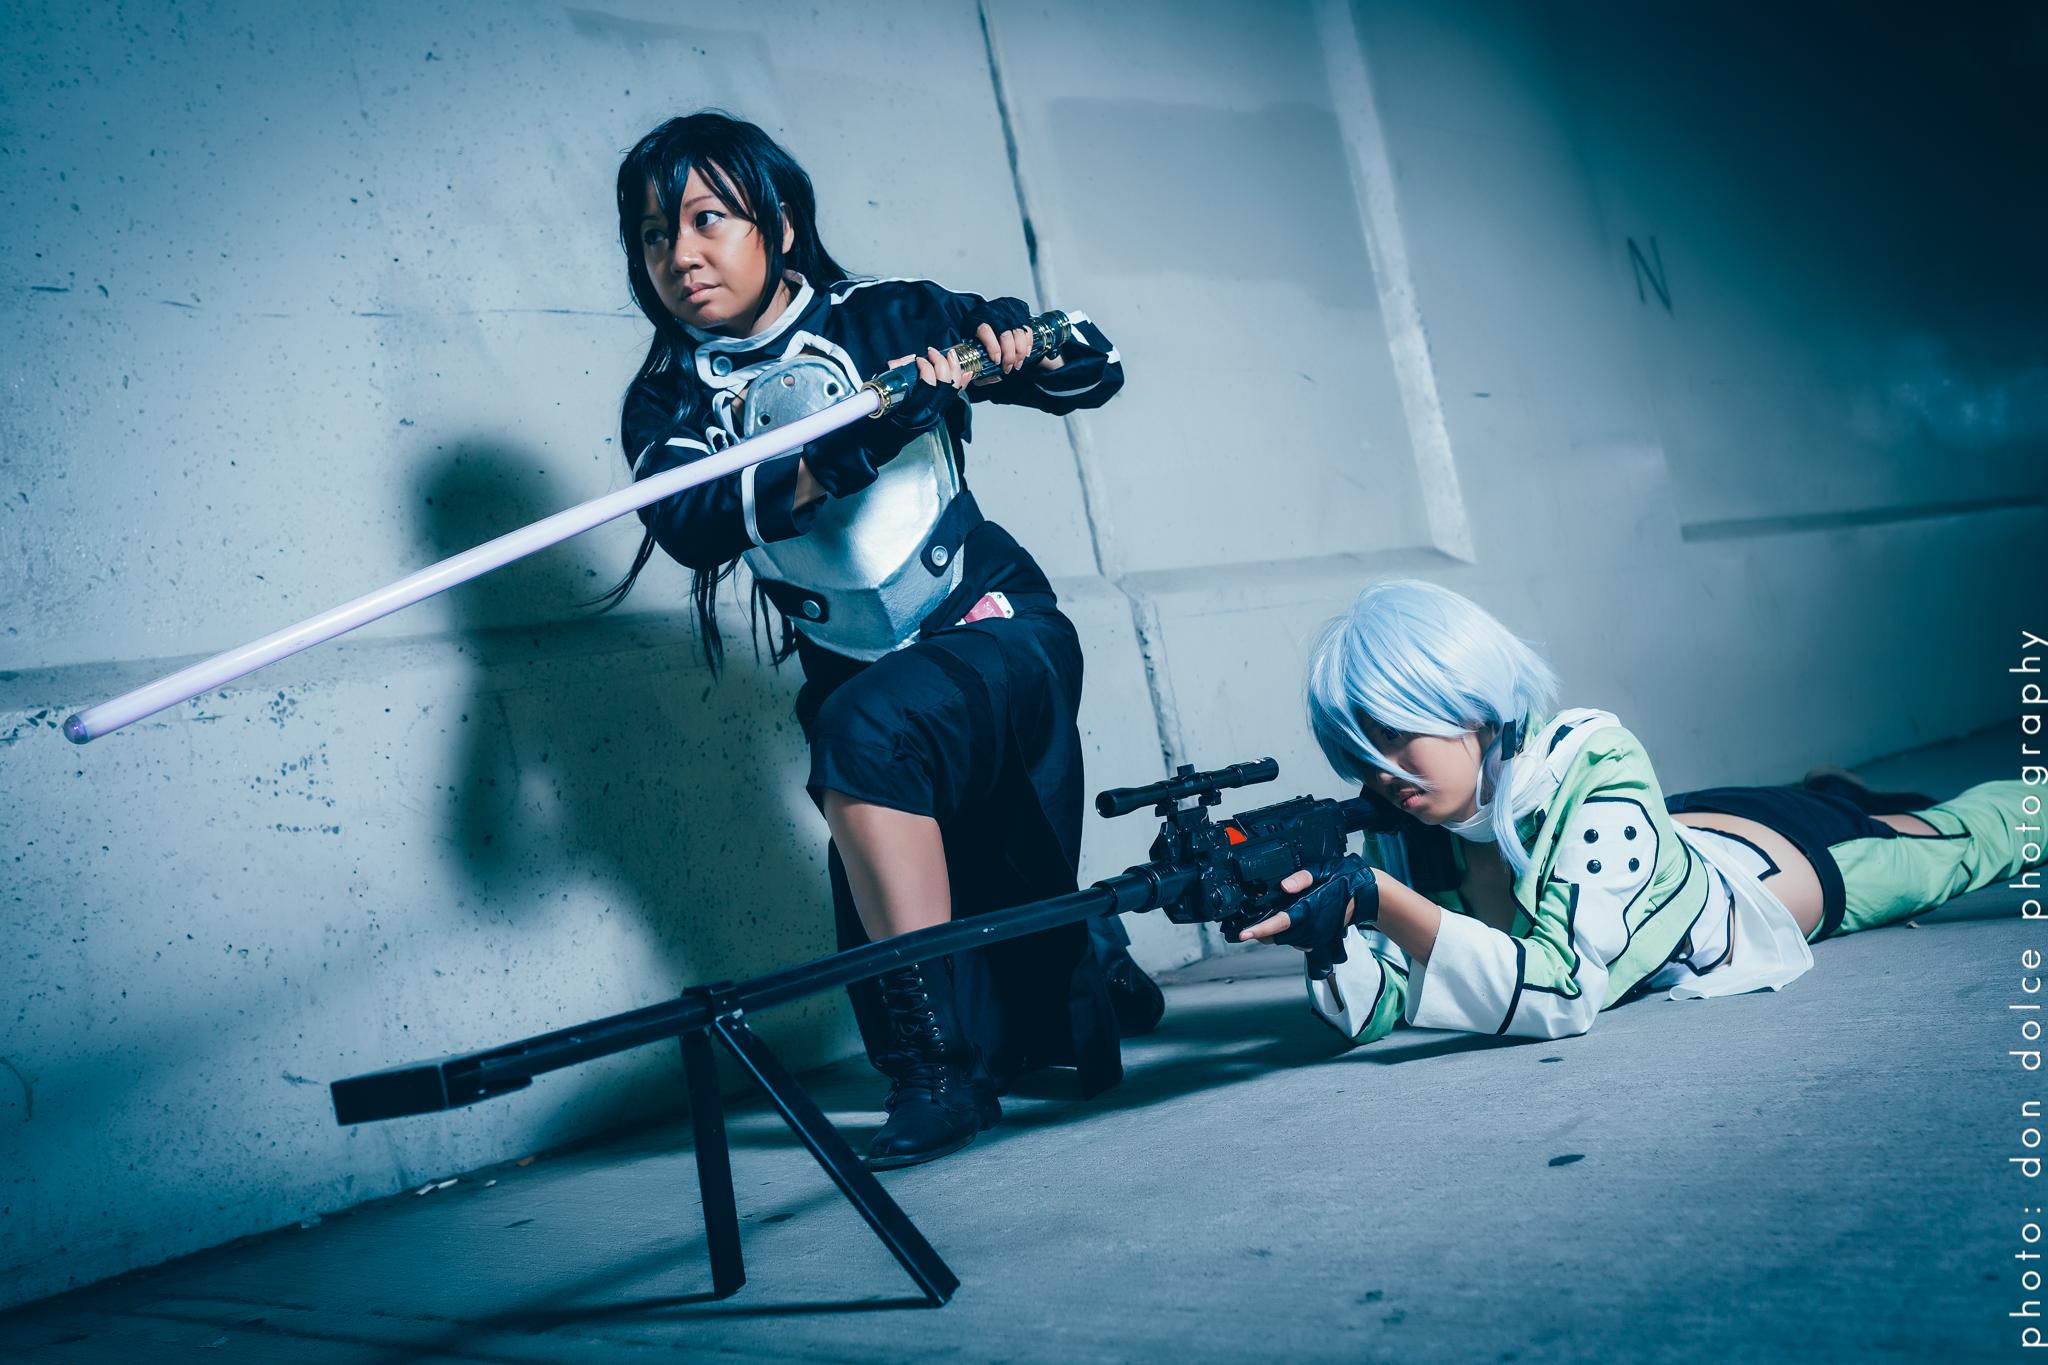 Kirito gun gale cosplay